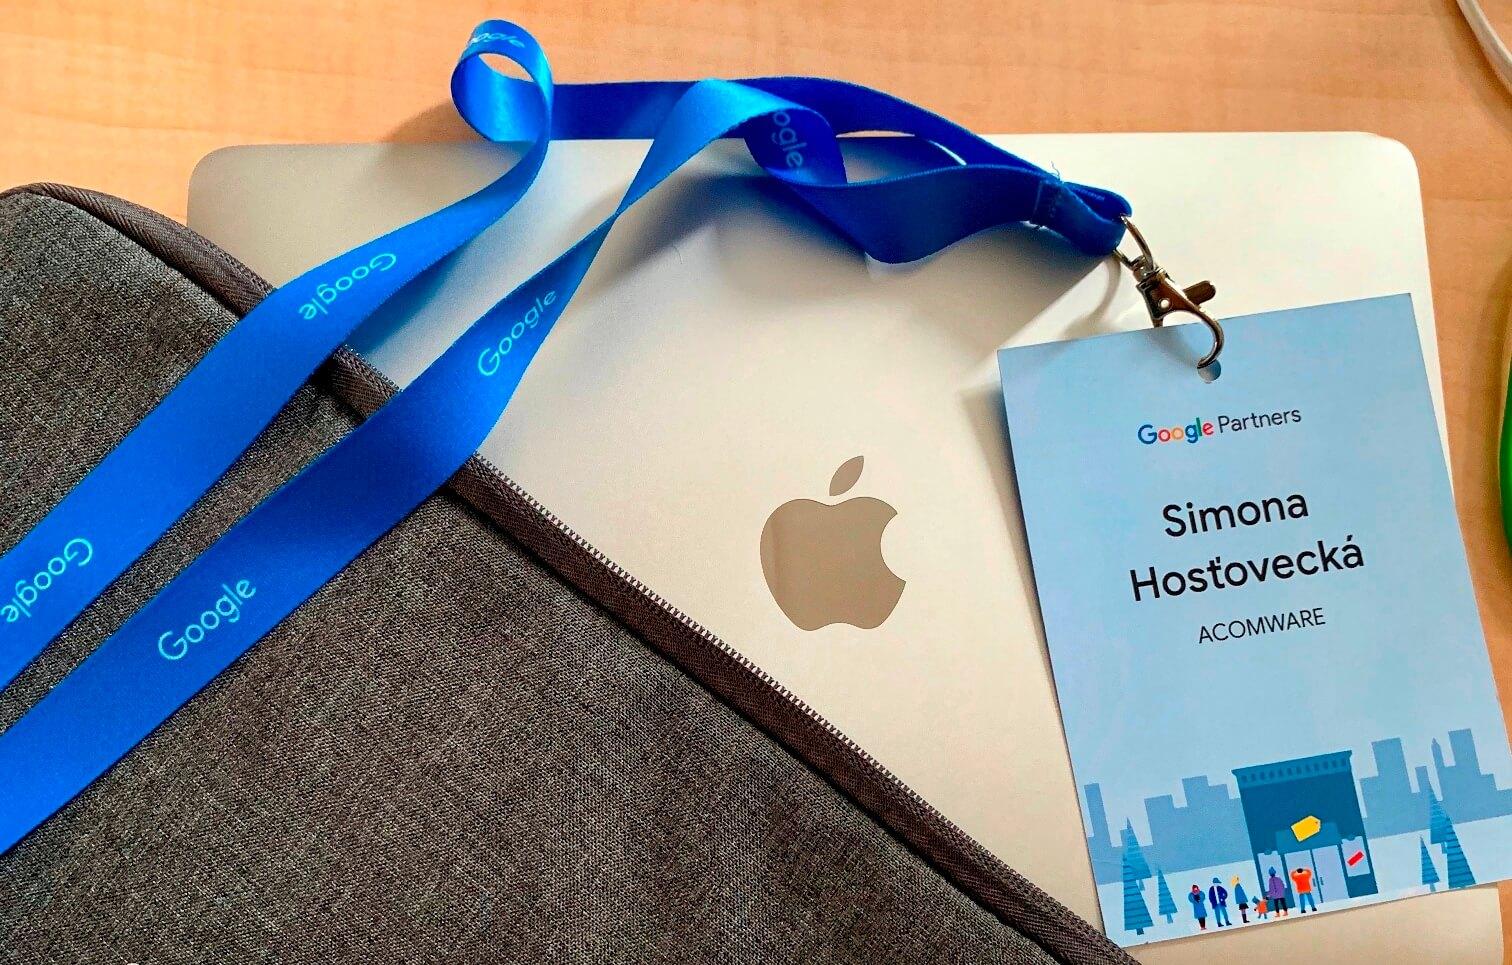 Simona-Hostovecka-Acomware-Google-Partners-event